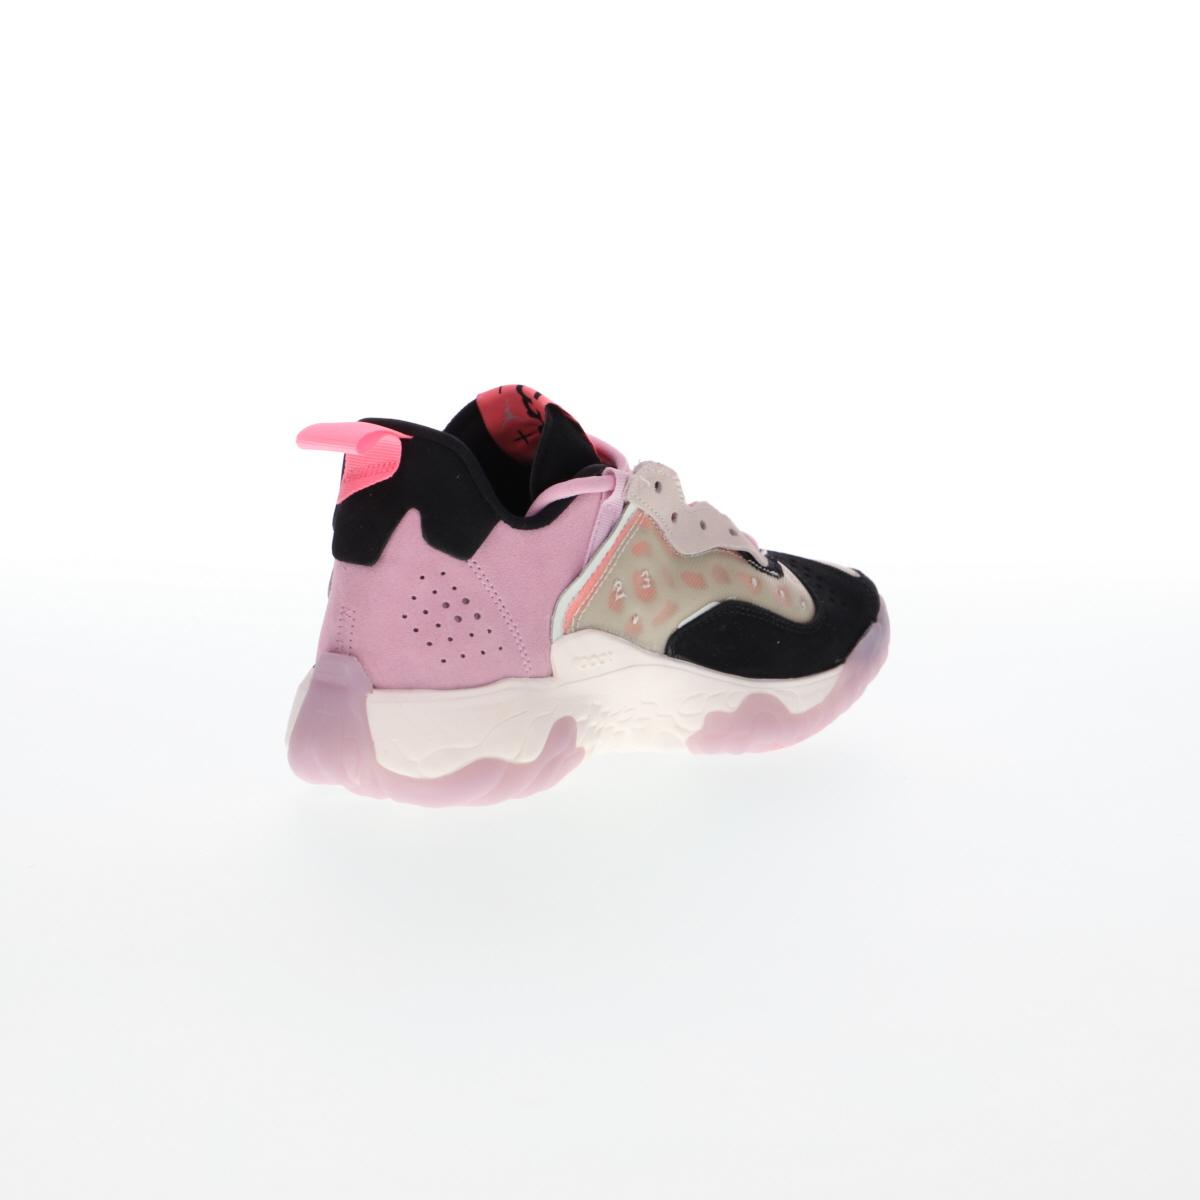 nike women posters 2016 3 women shoes for kids